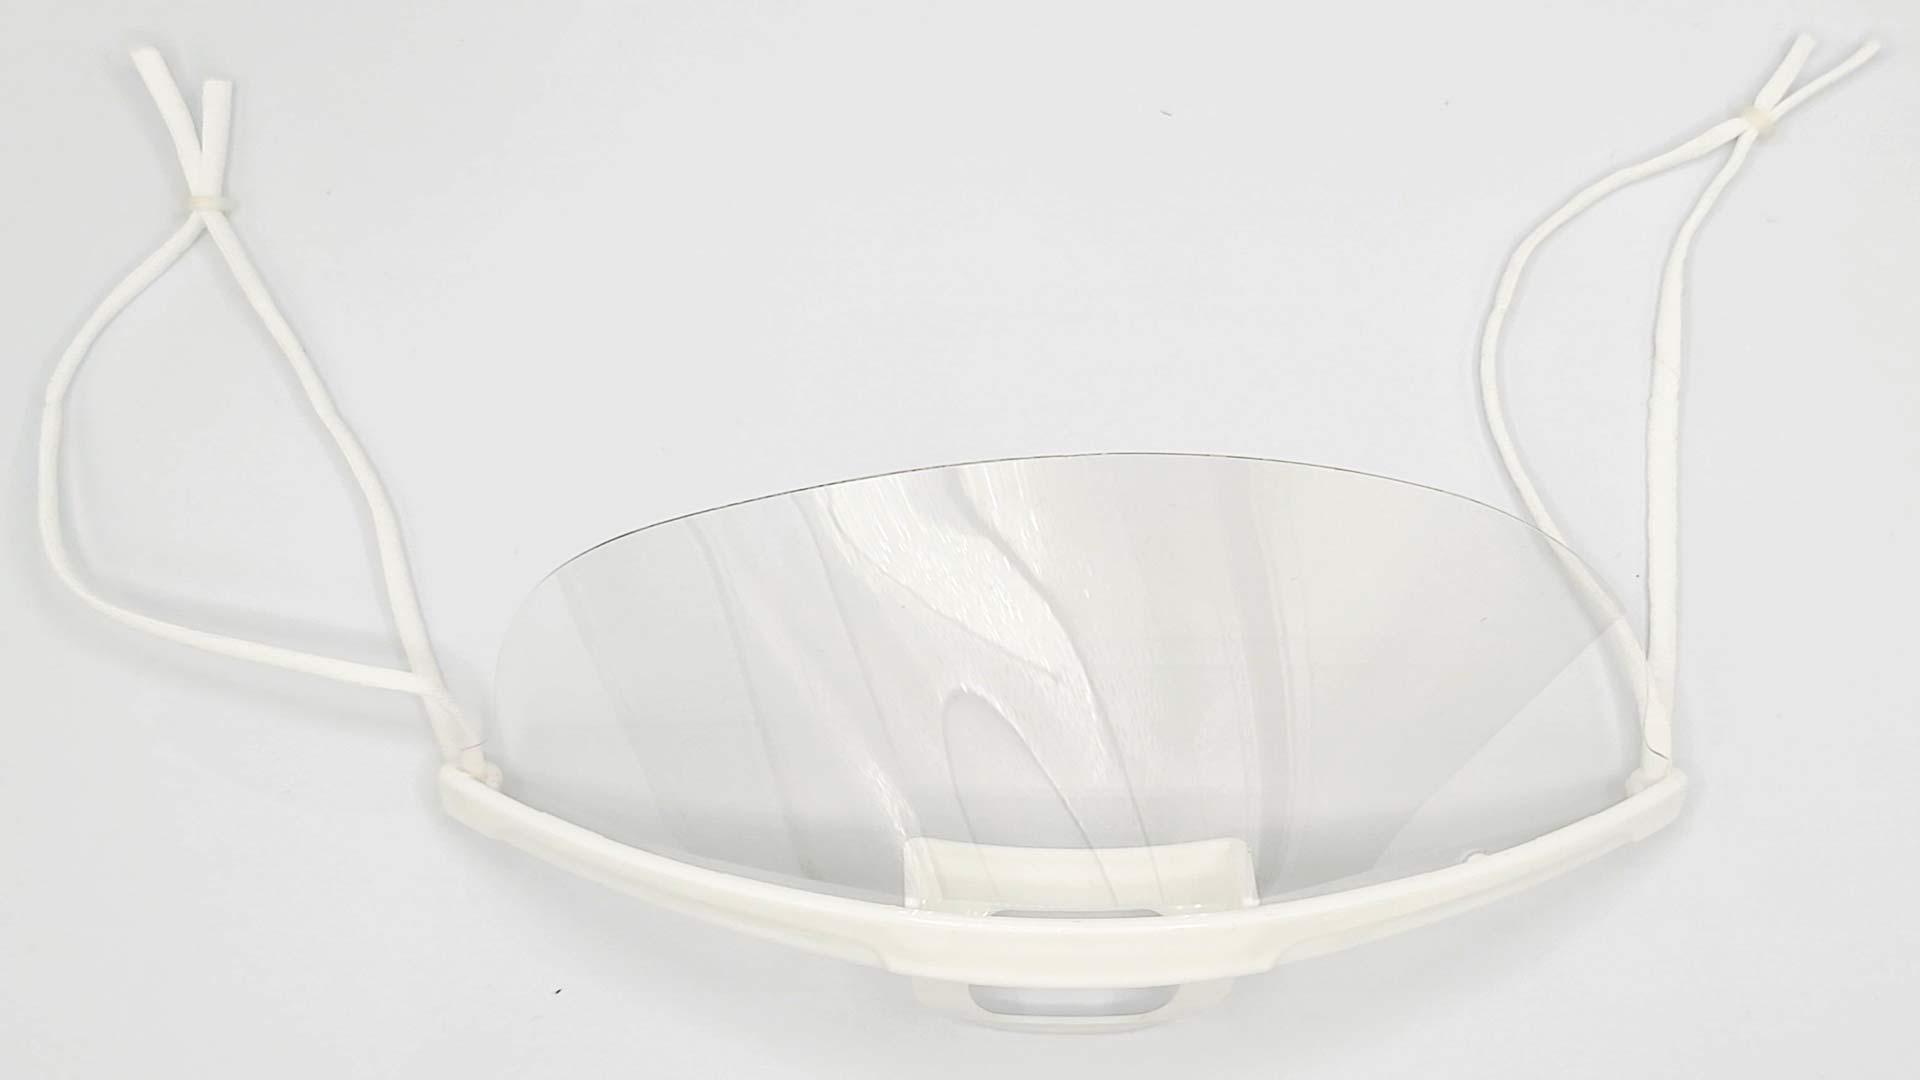 mouth shield